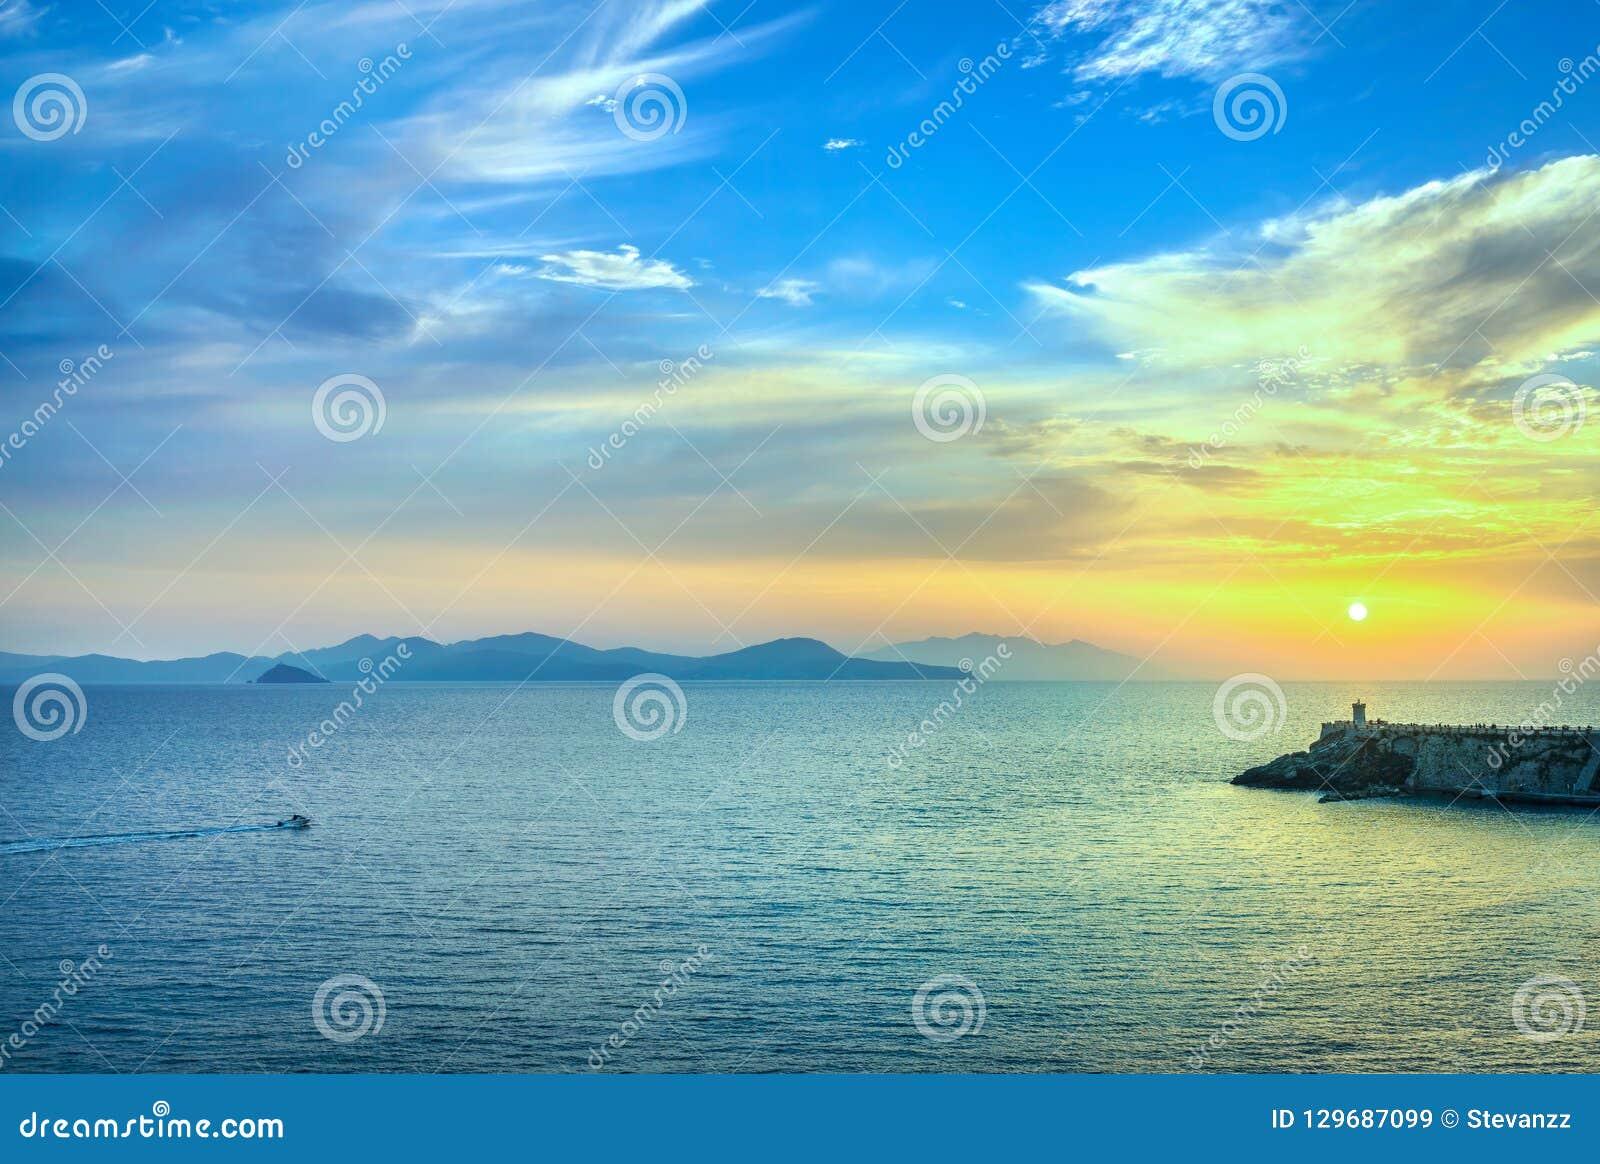 Sunset view of Elba Island and Piombino piazza bovio lighthouse.